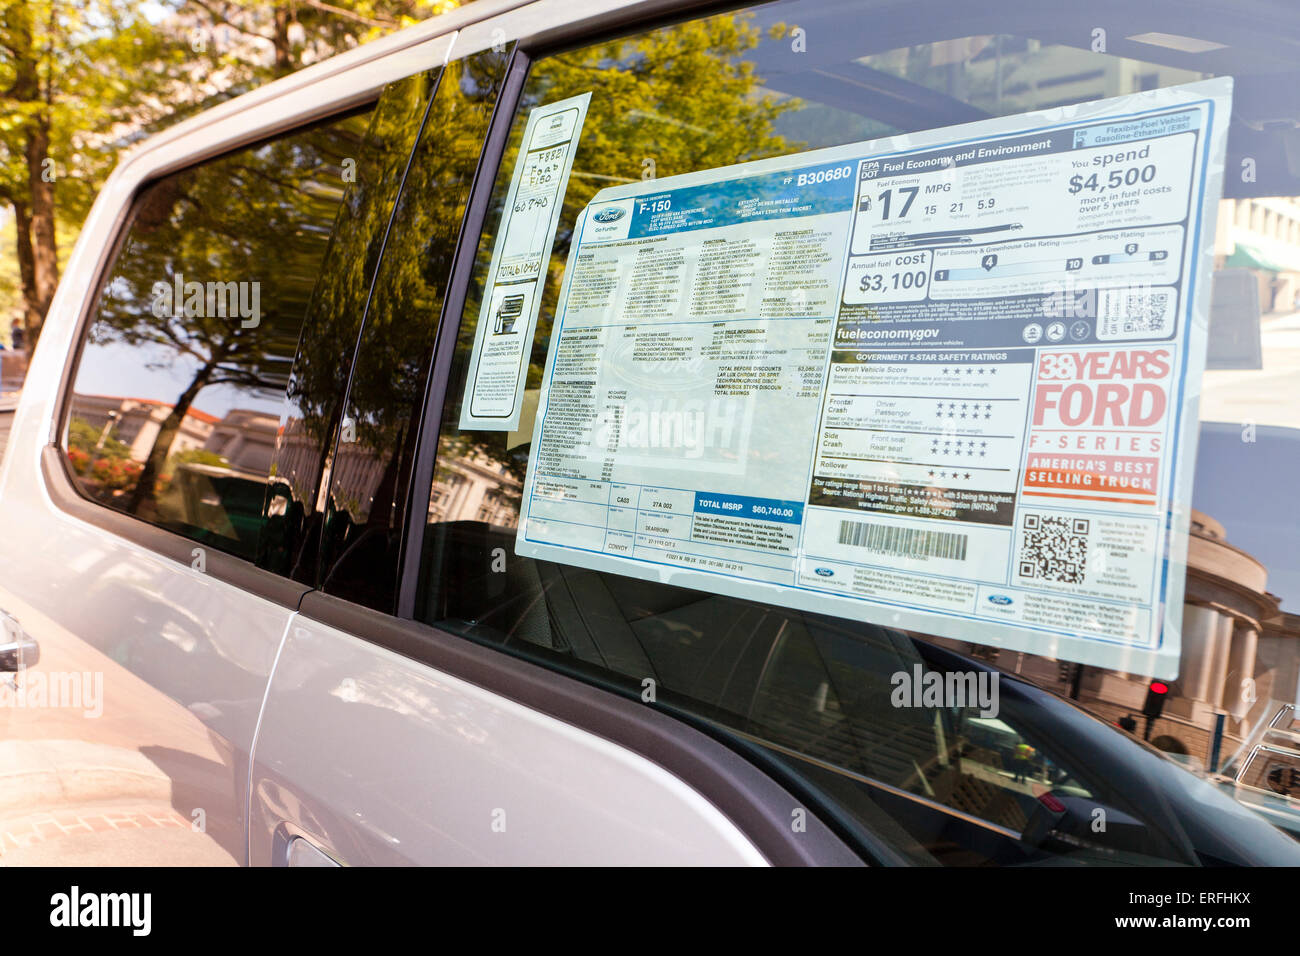 2015 Ford F-150 4X4 pickup truck Monroney sticker on window - USA - Stock Image